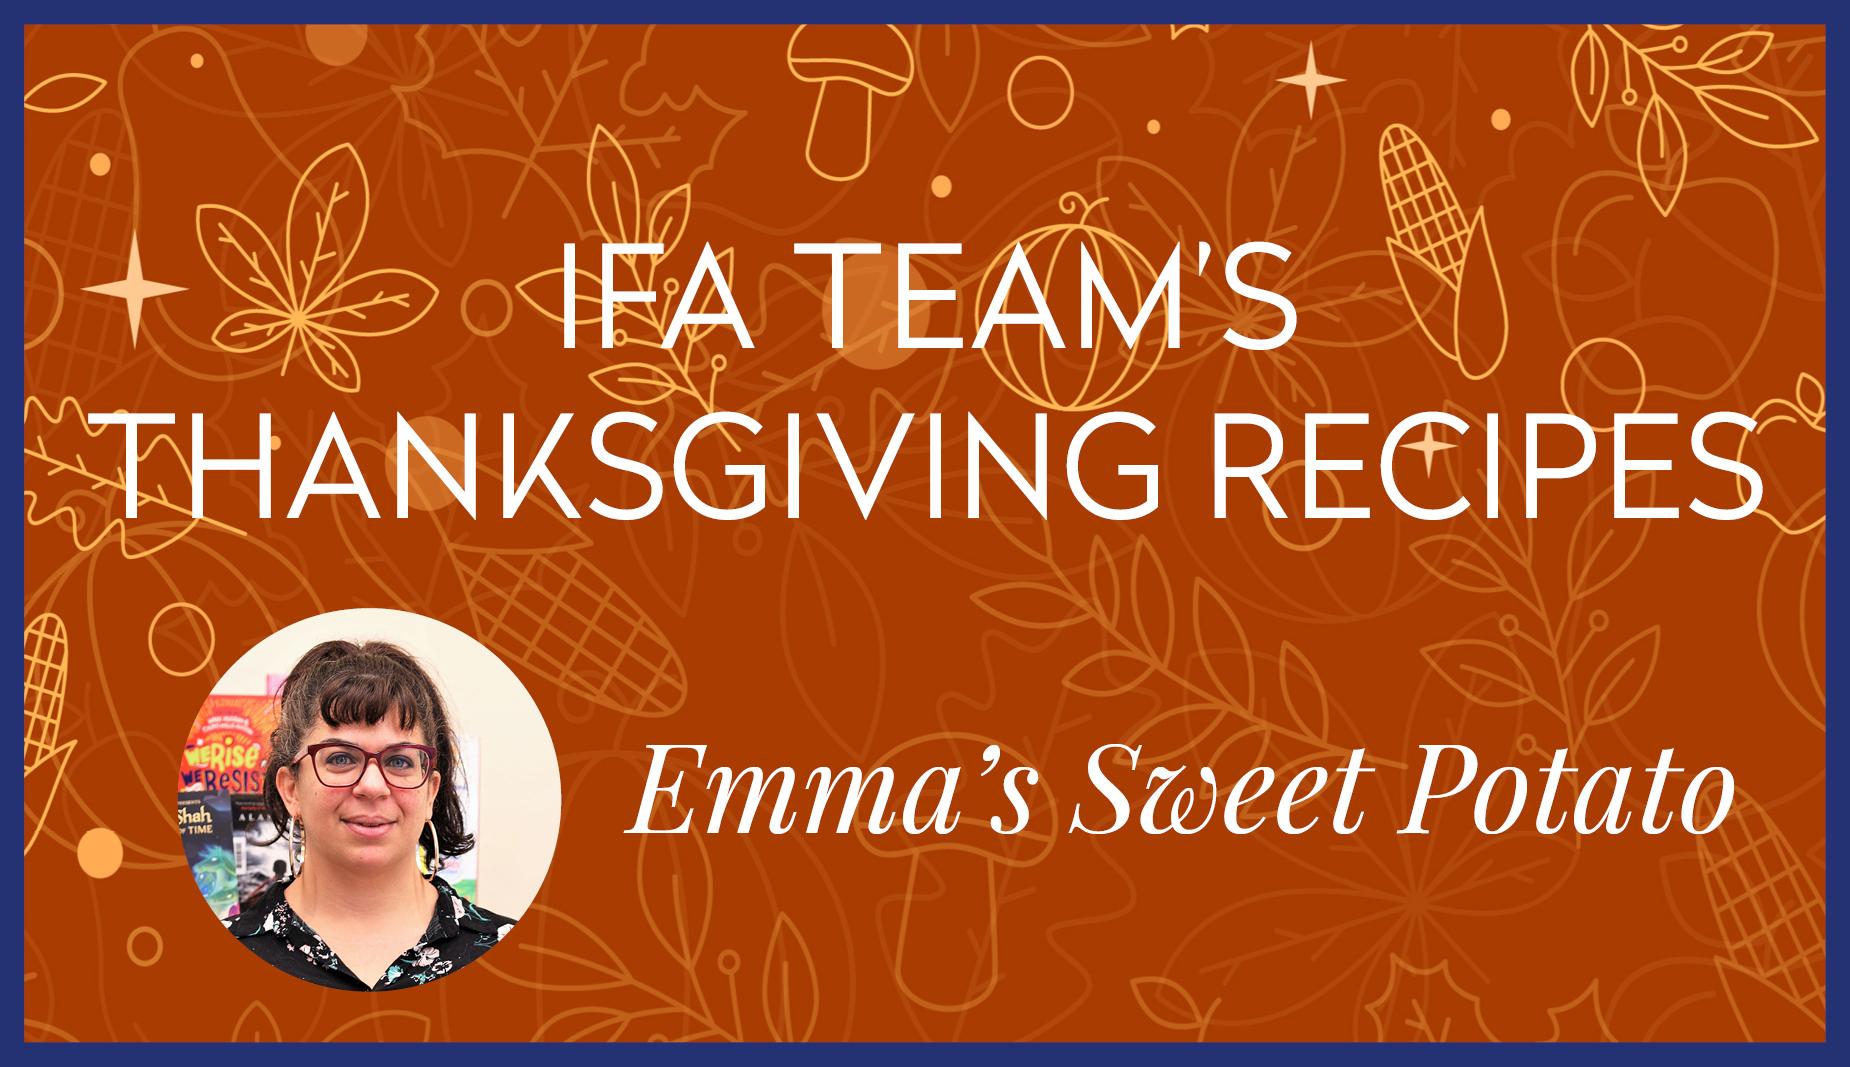 Emma Sweet Potato